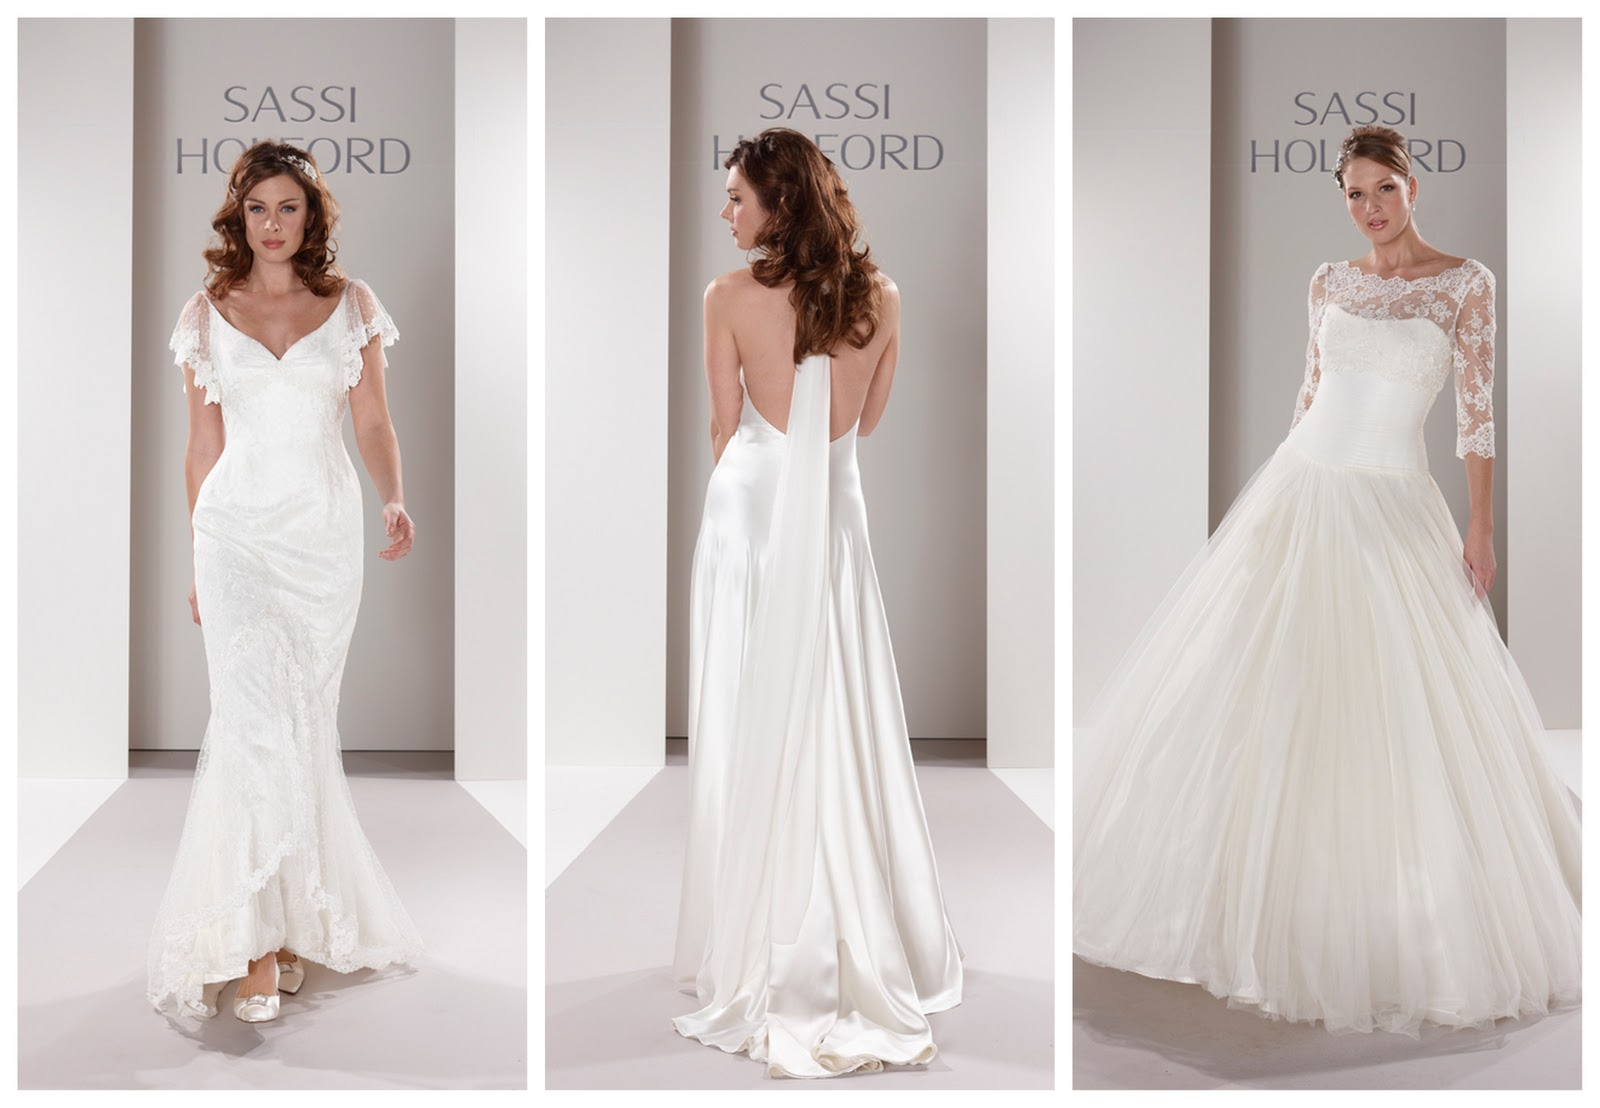 Sample Sale Wedding Dresses 42 Simple The Bridal Designer Sale